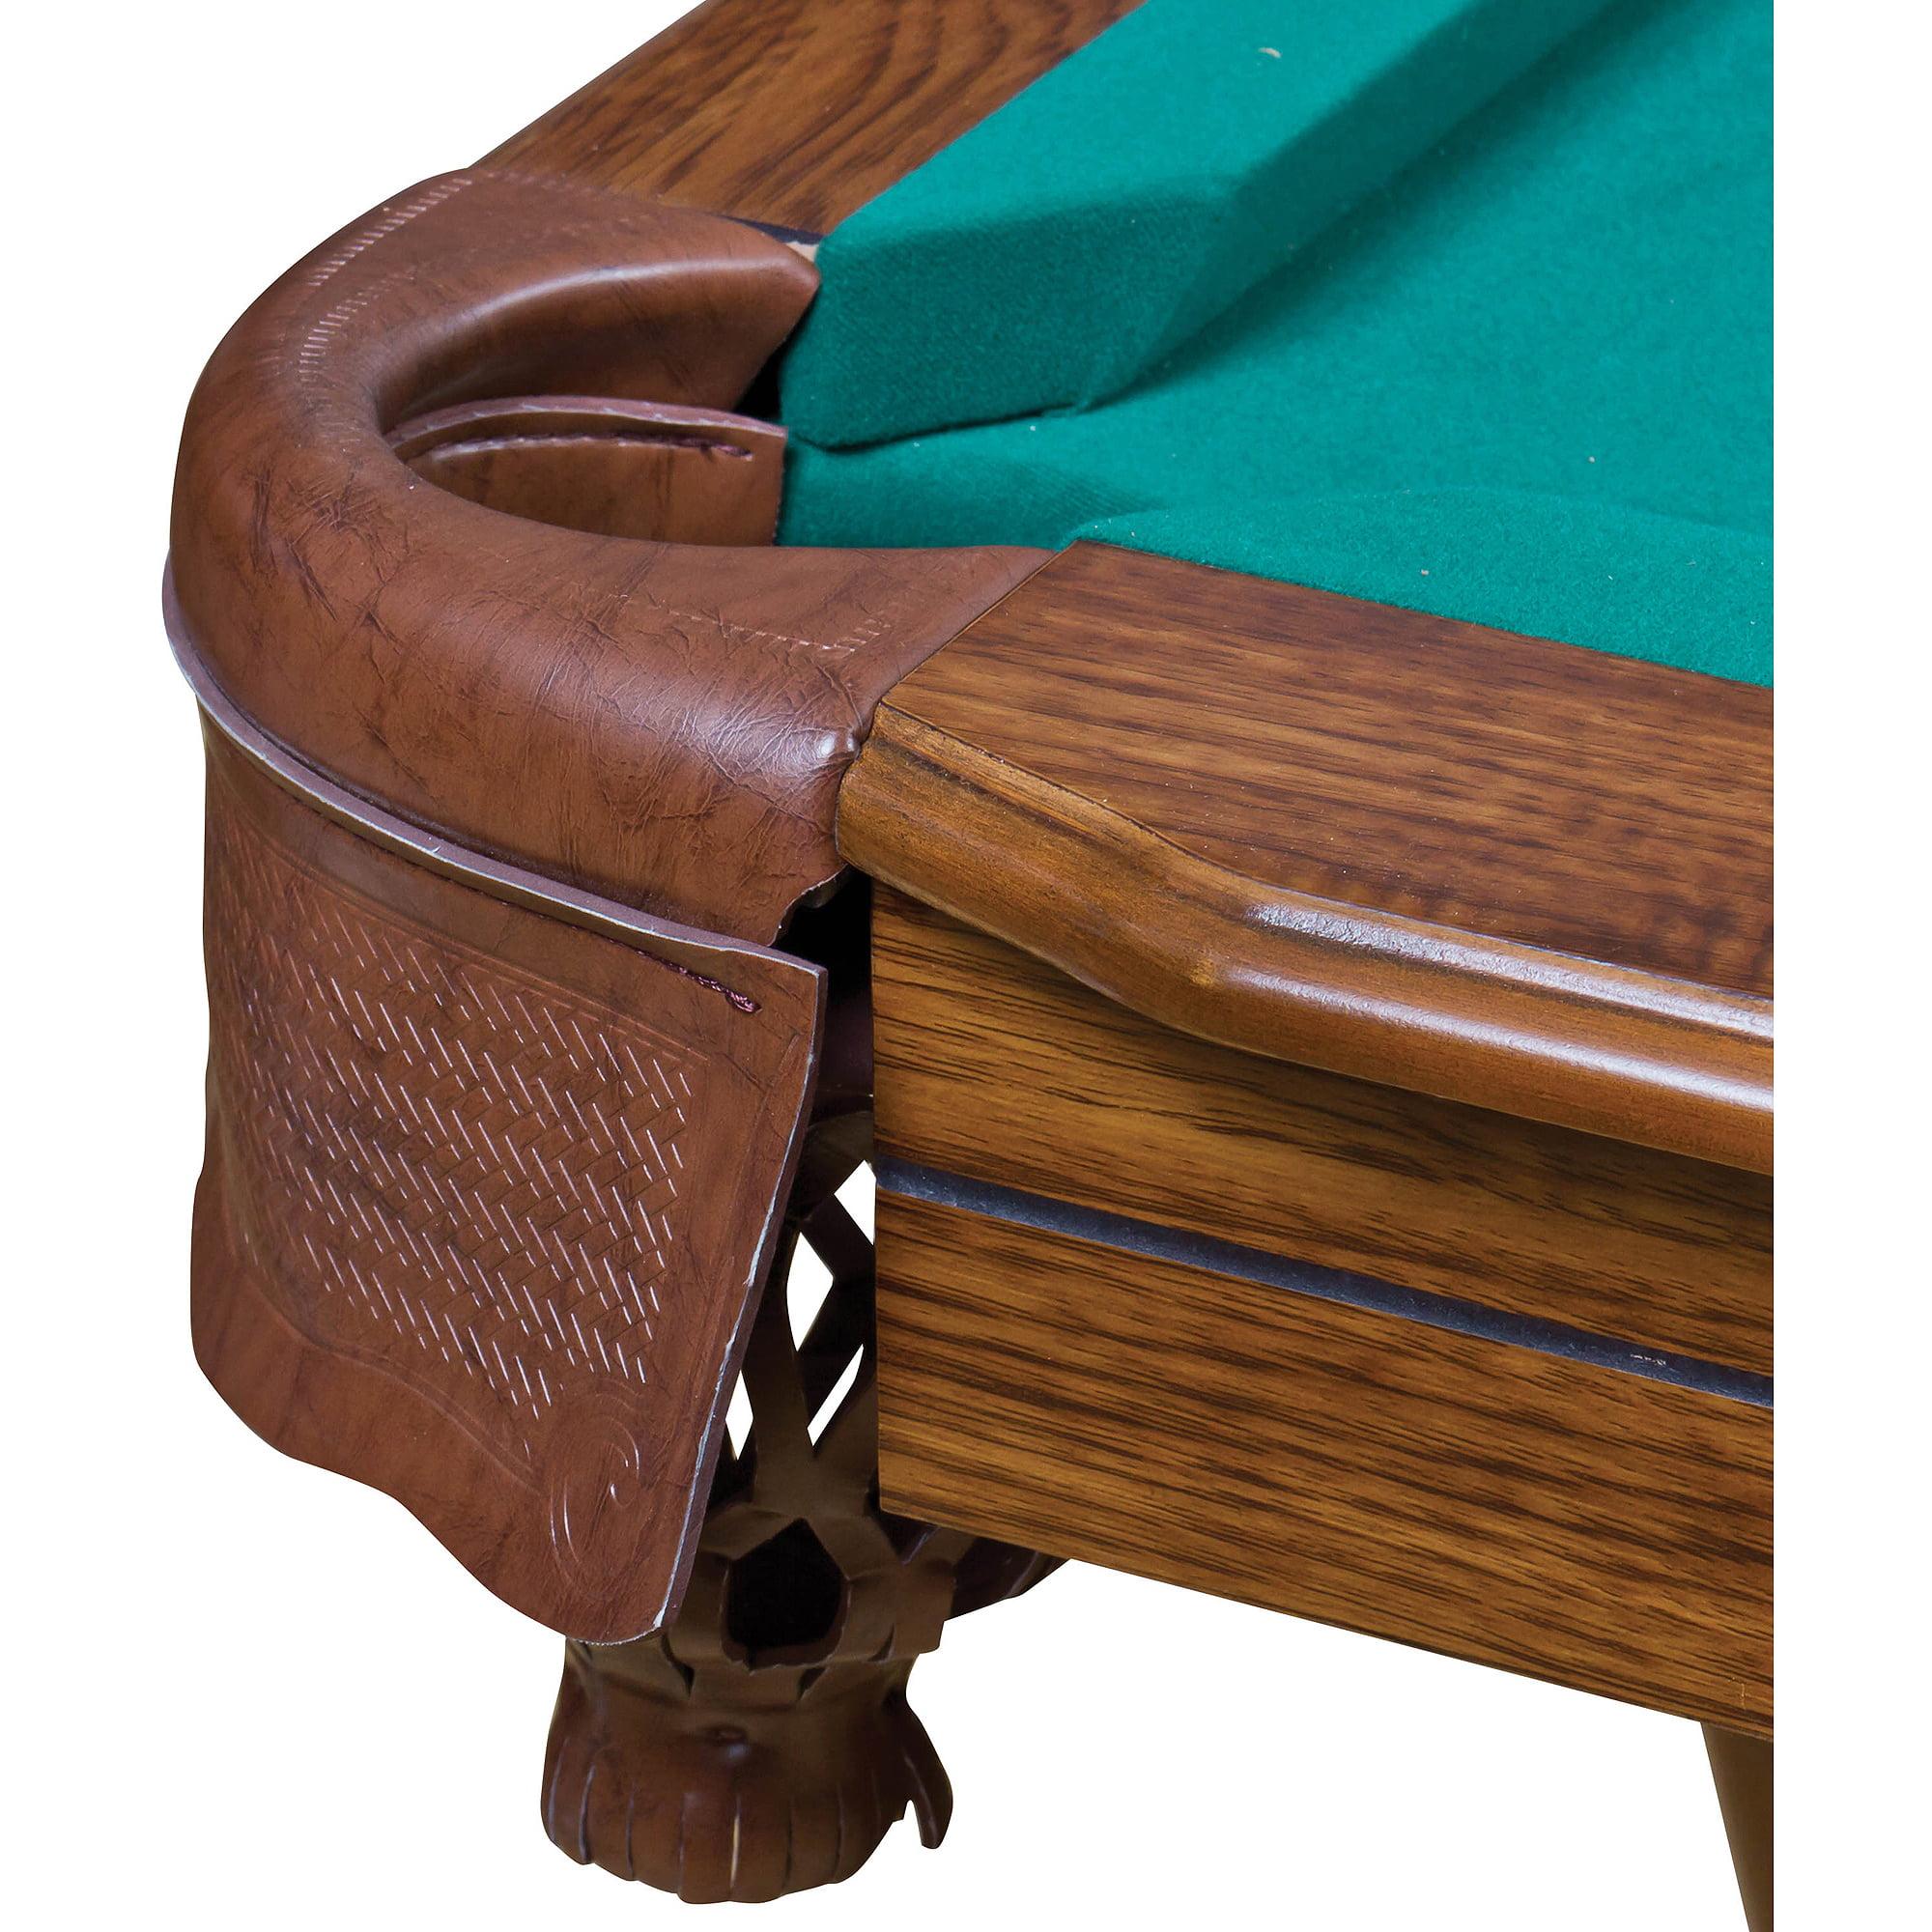 Exceptionnel EastPoint Sports 7.25u0027 Brighton Billiard Pool Table, Green Cloth    Walmart.com